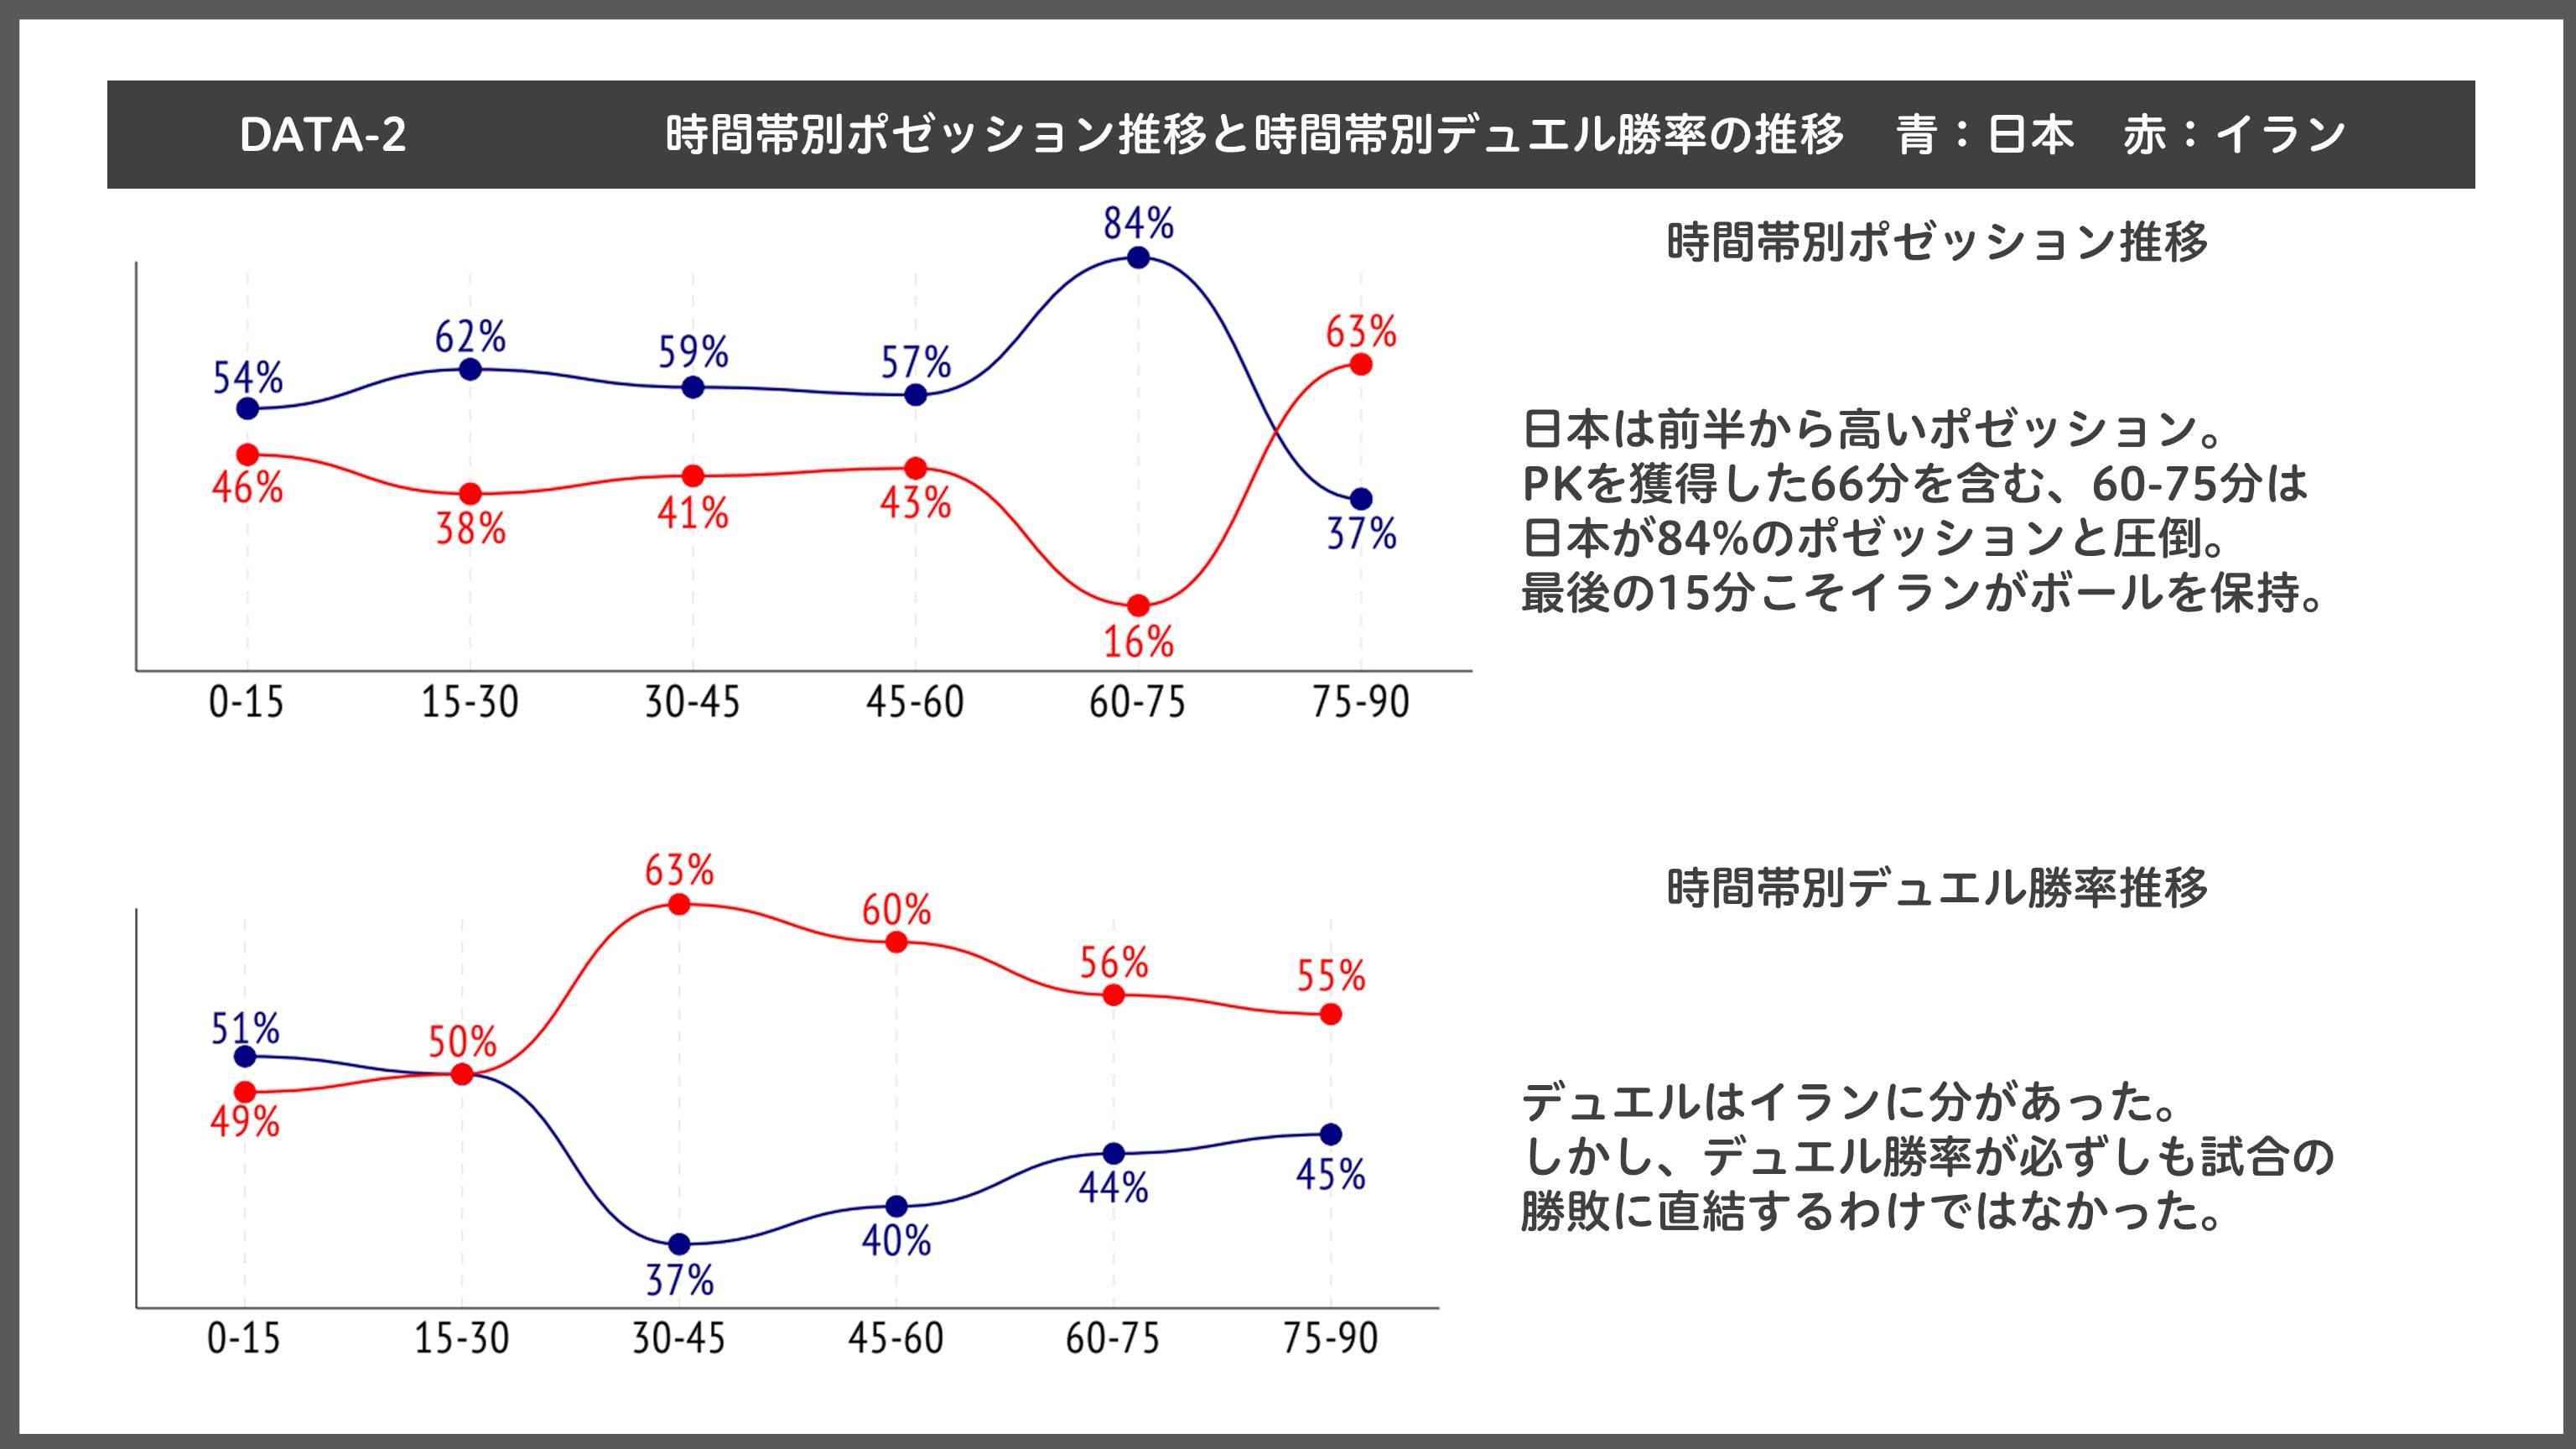 [DATA-2]日本とイランの時間帯別ポゼッションとデュエル勝率の推移【表:Evolving Data】